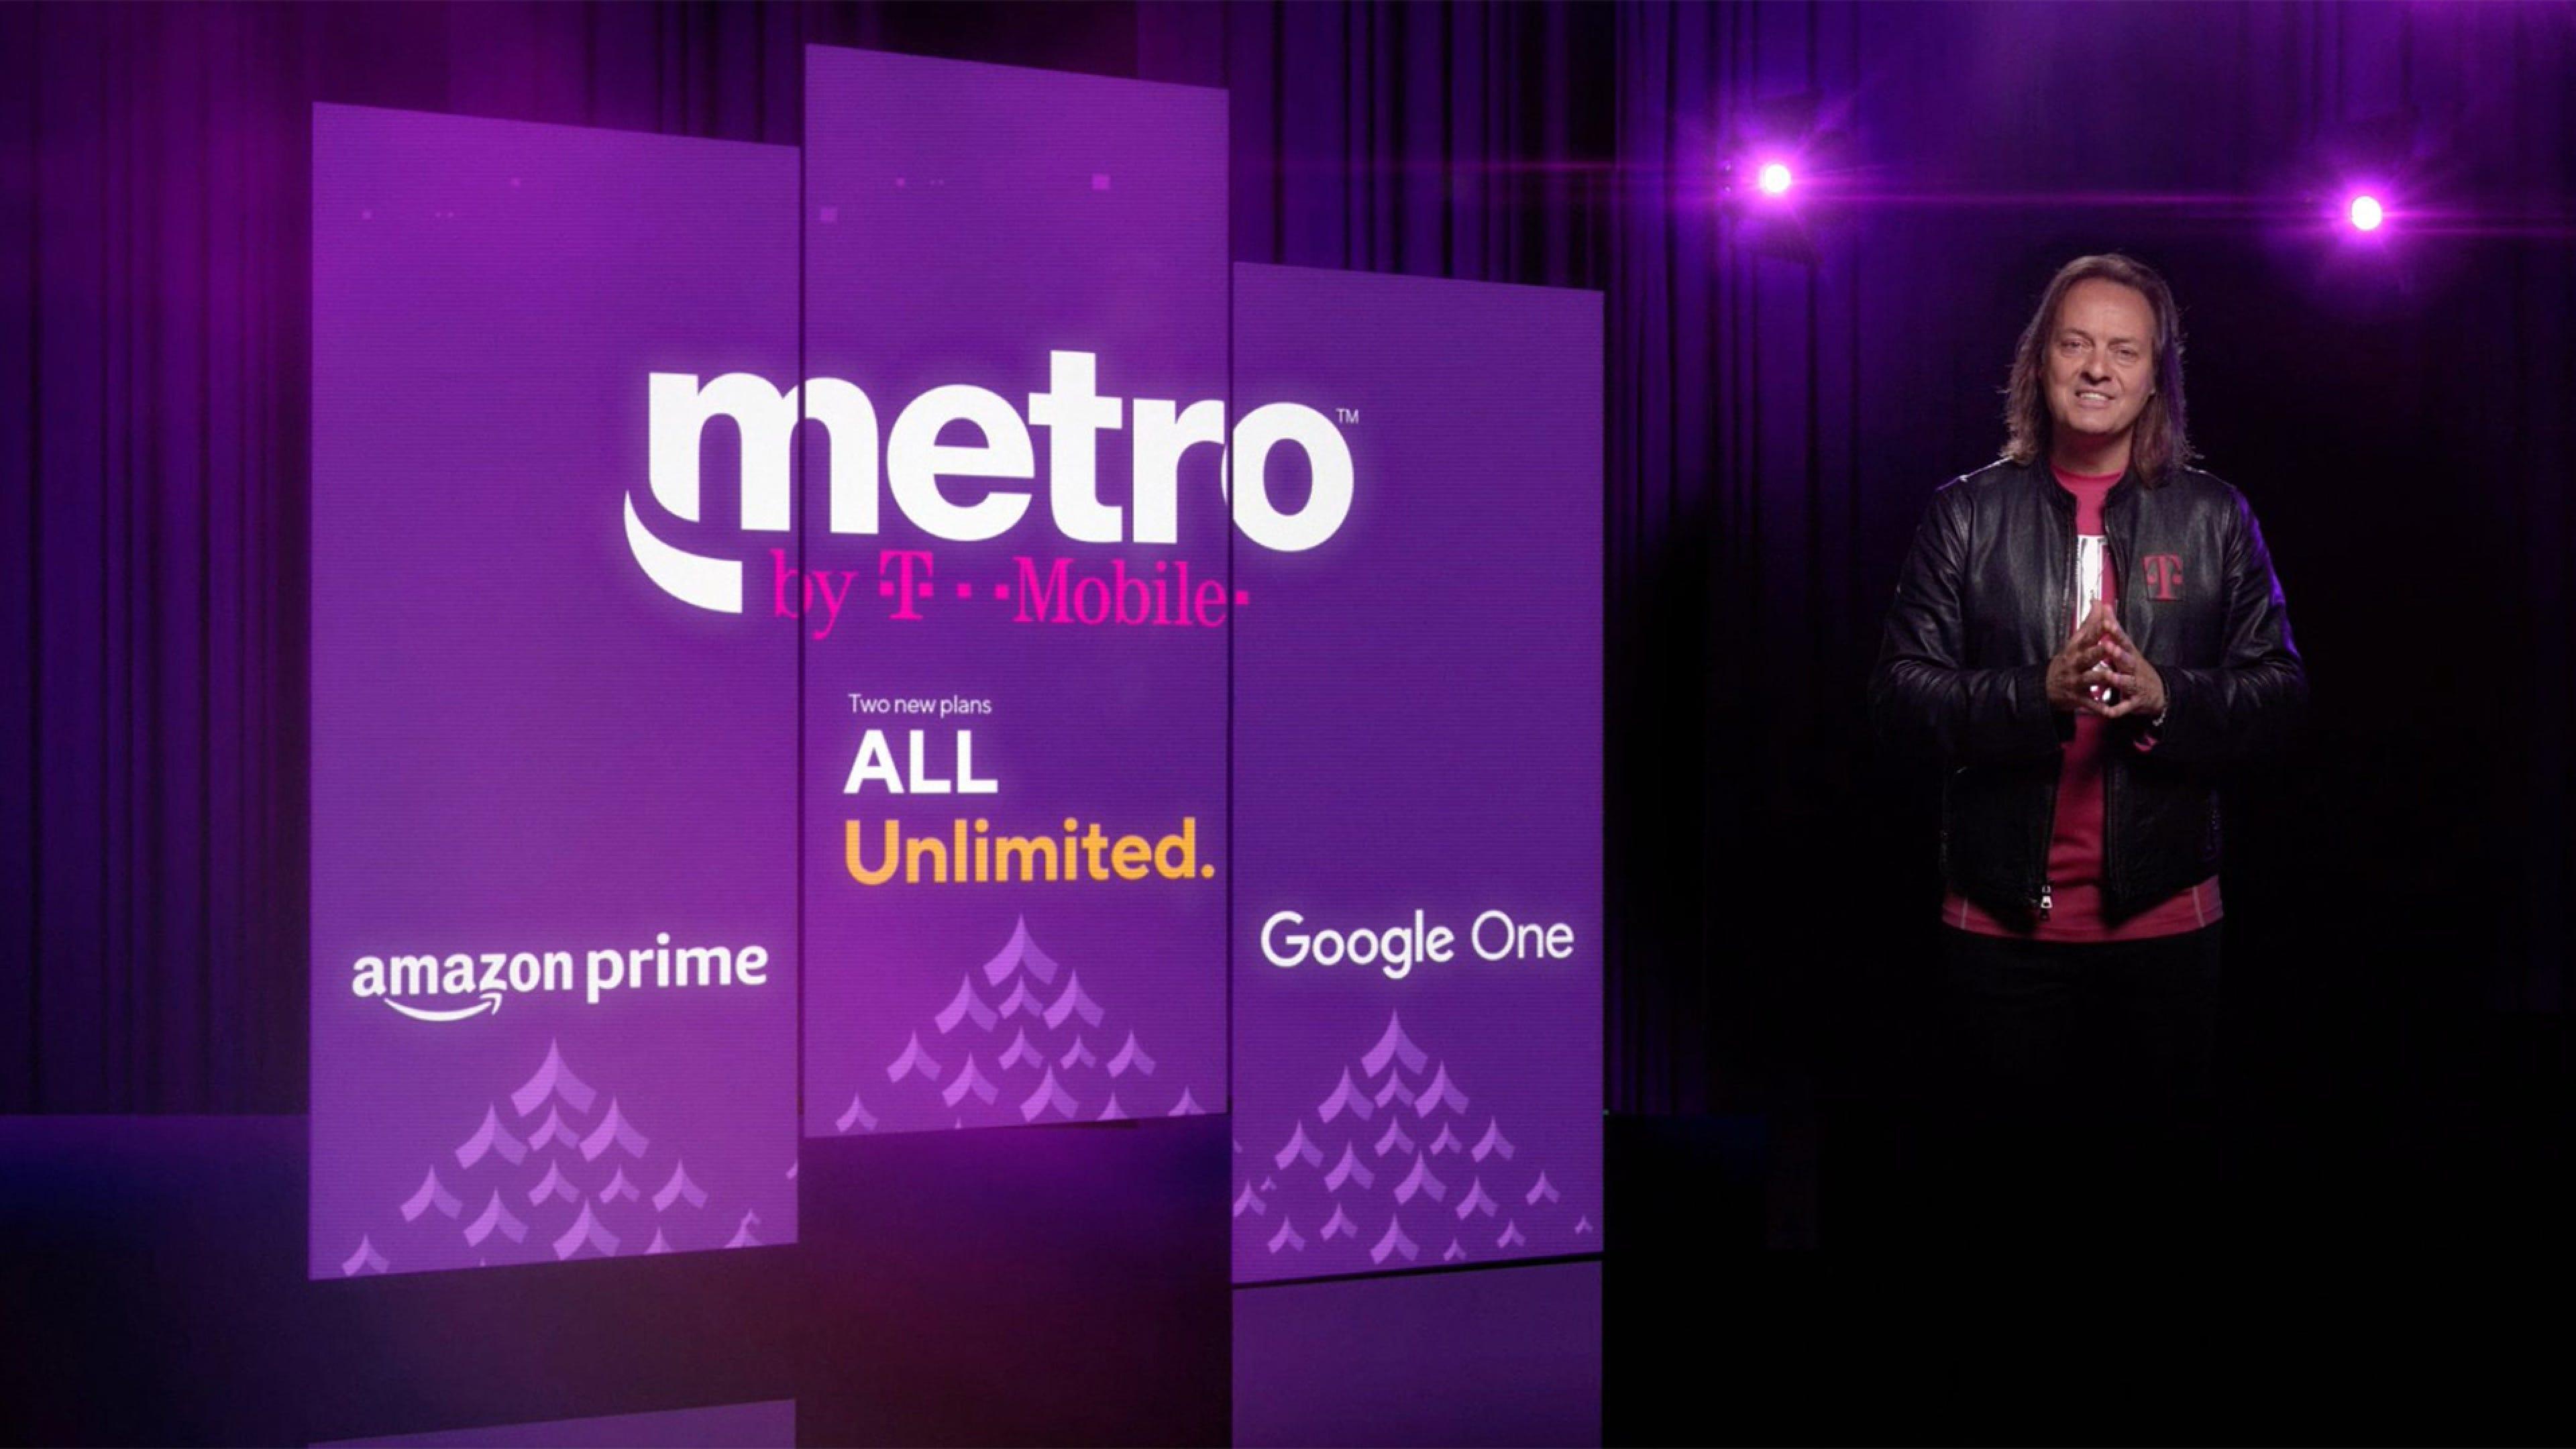 T-Mobile Rebrands MetroPCS, Will Now Bundle Amazon Prime